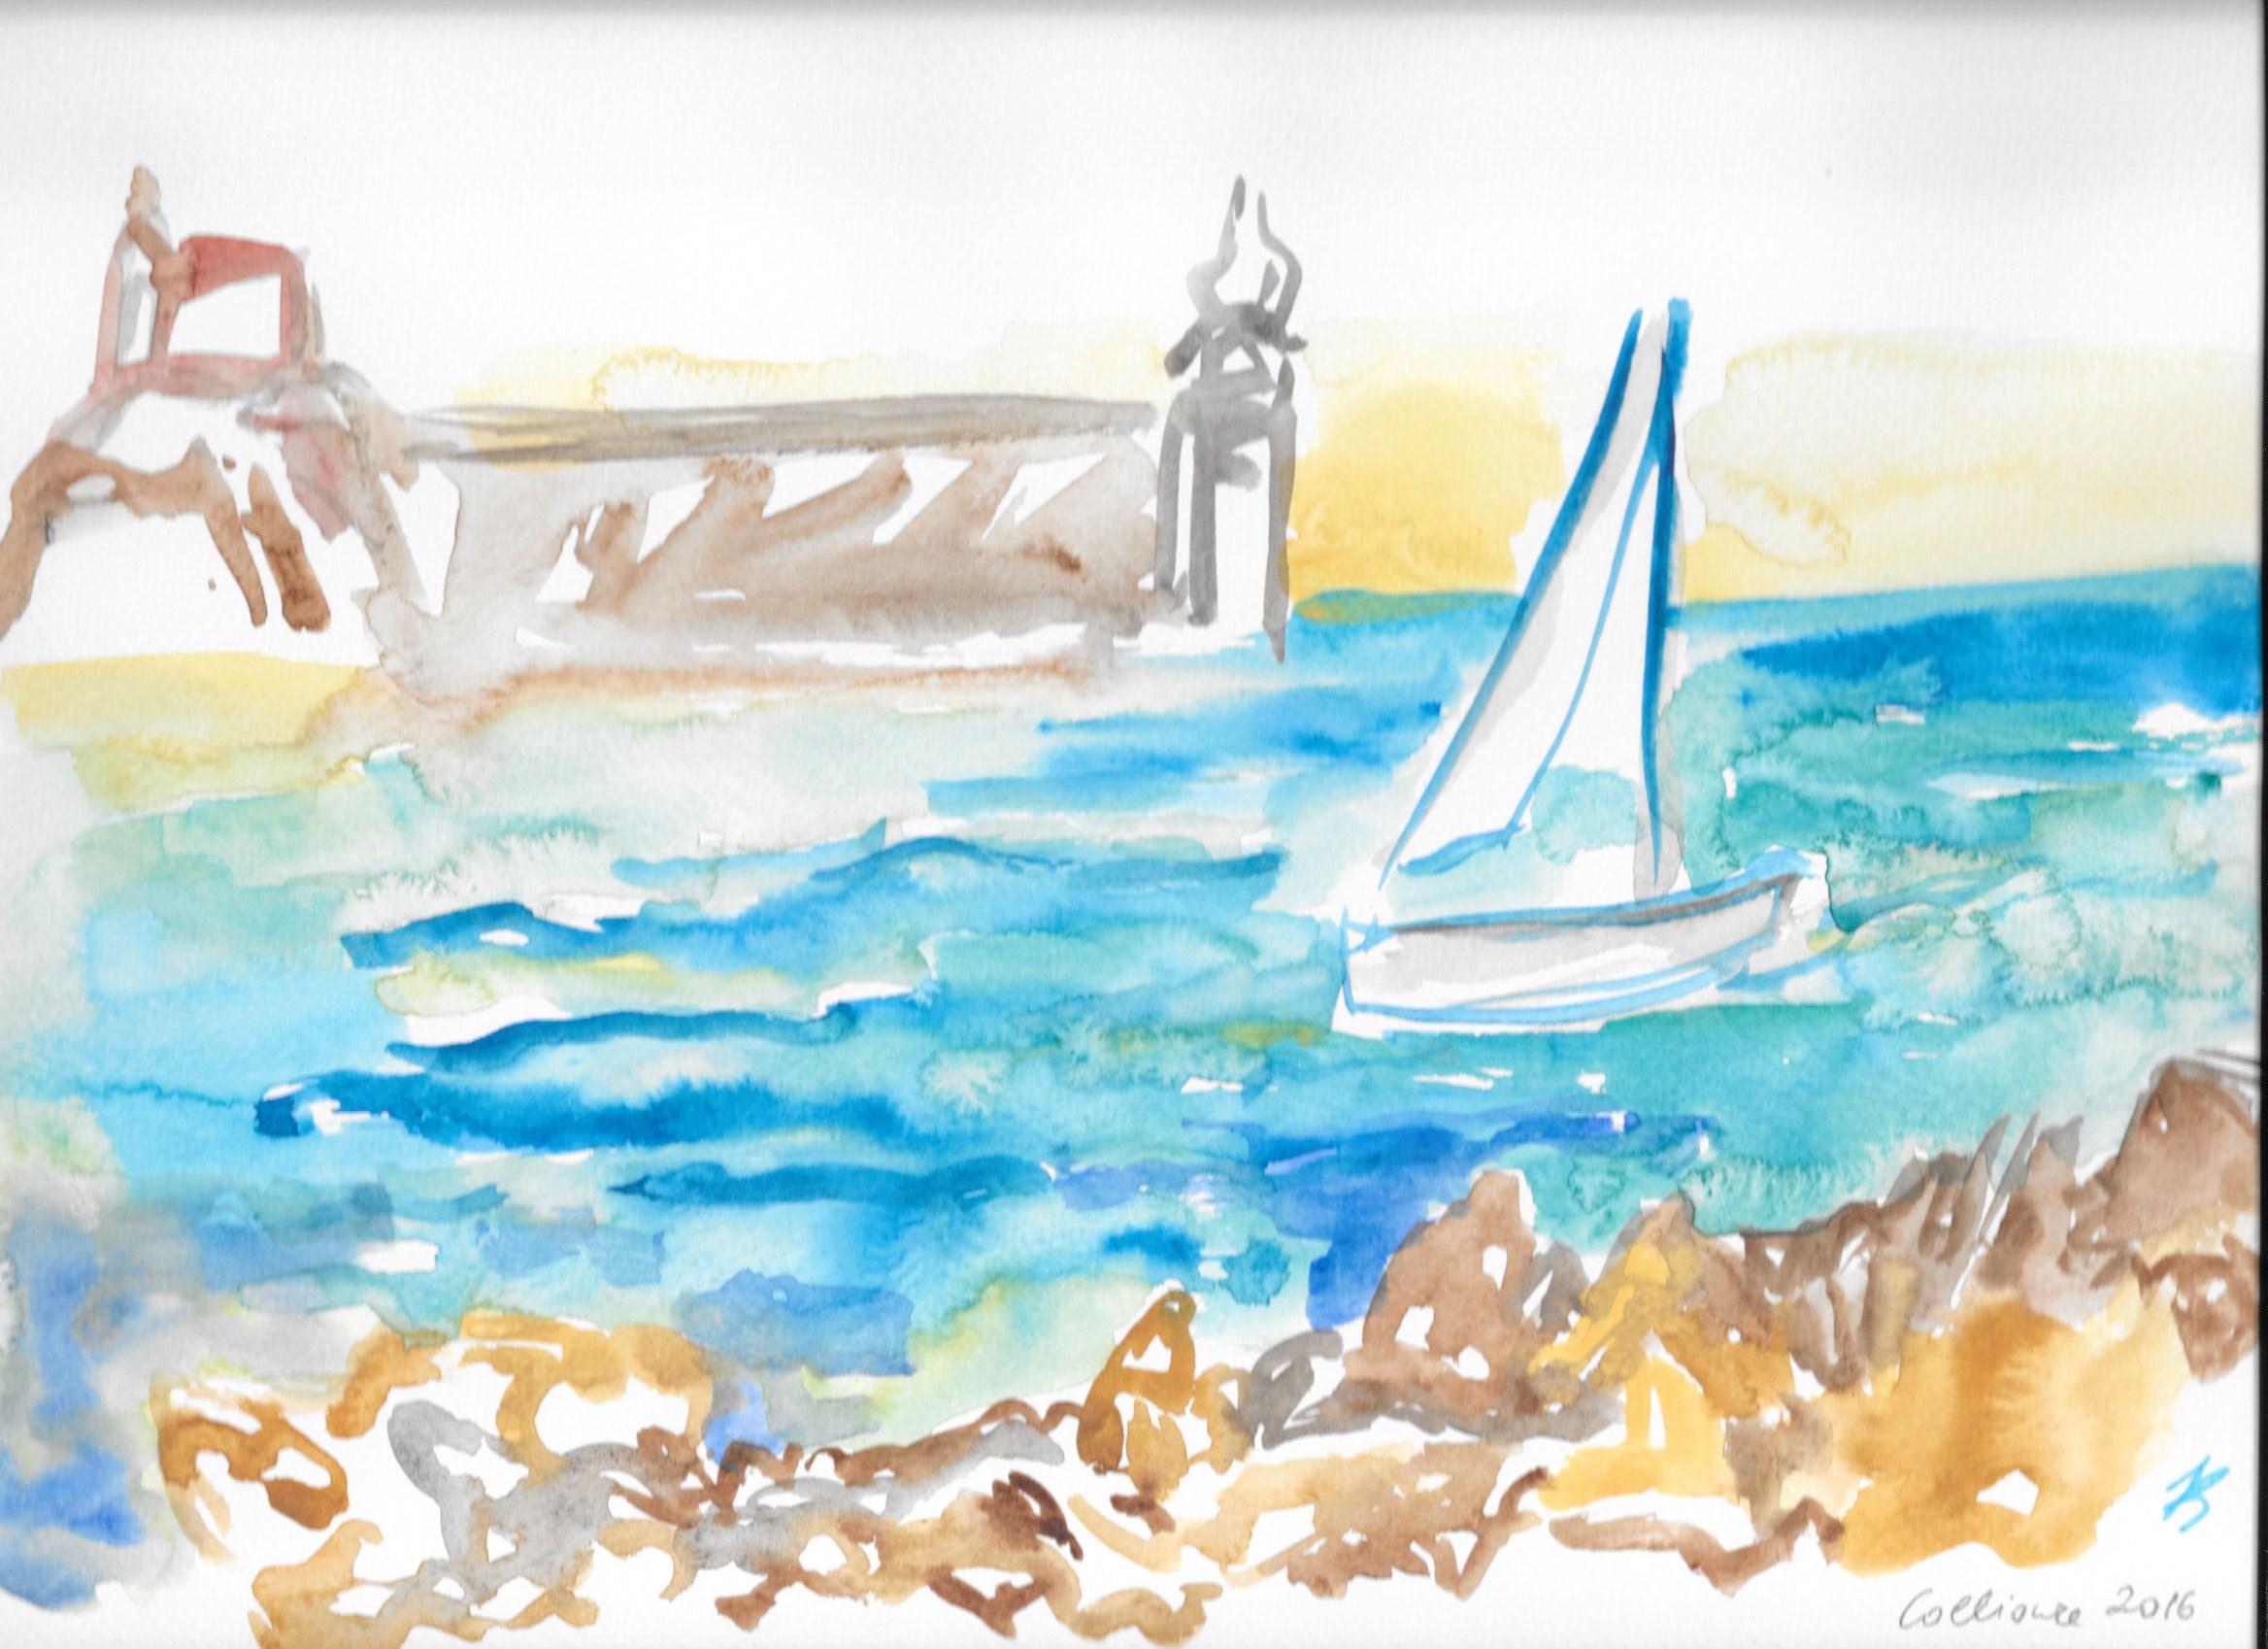 Collioure 2016 d 1